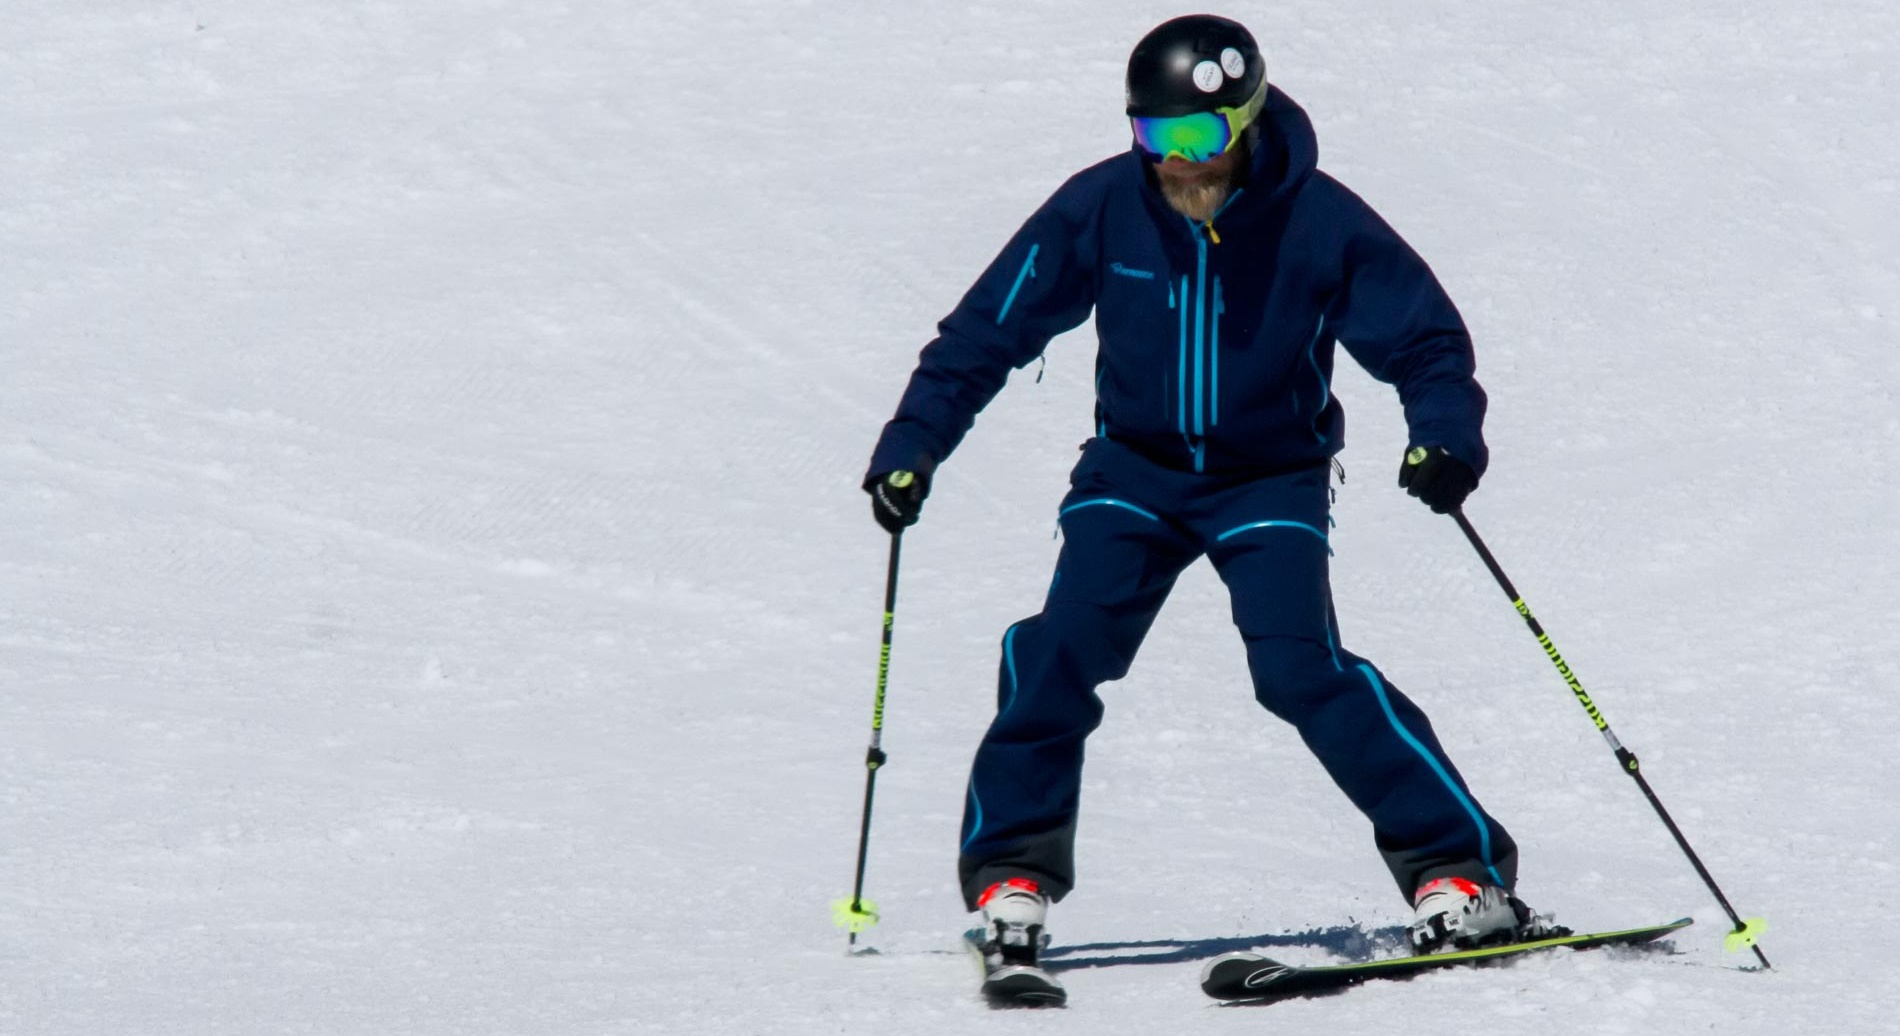 Fun&Snow Skiinstructor Beginner